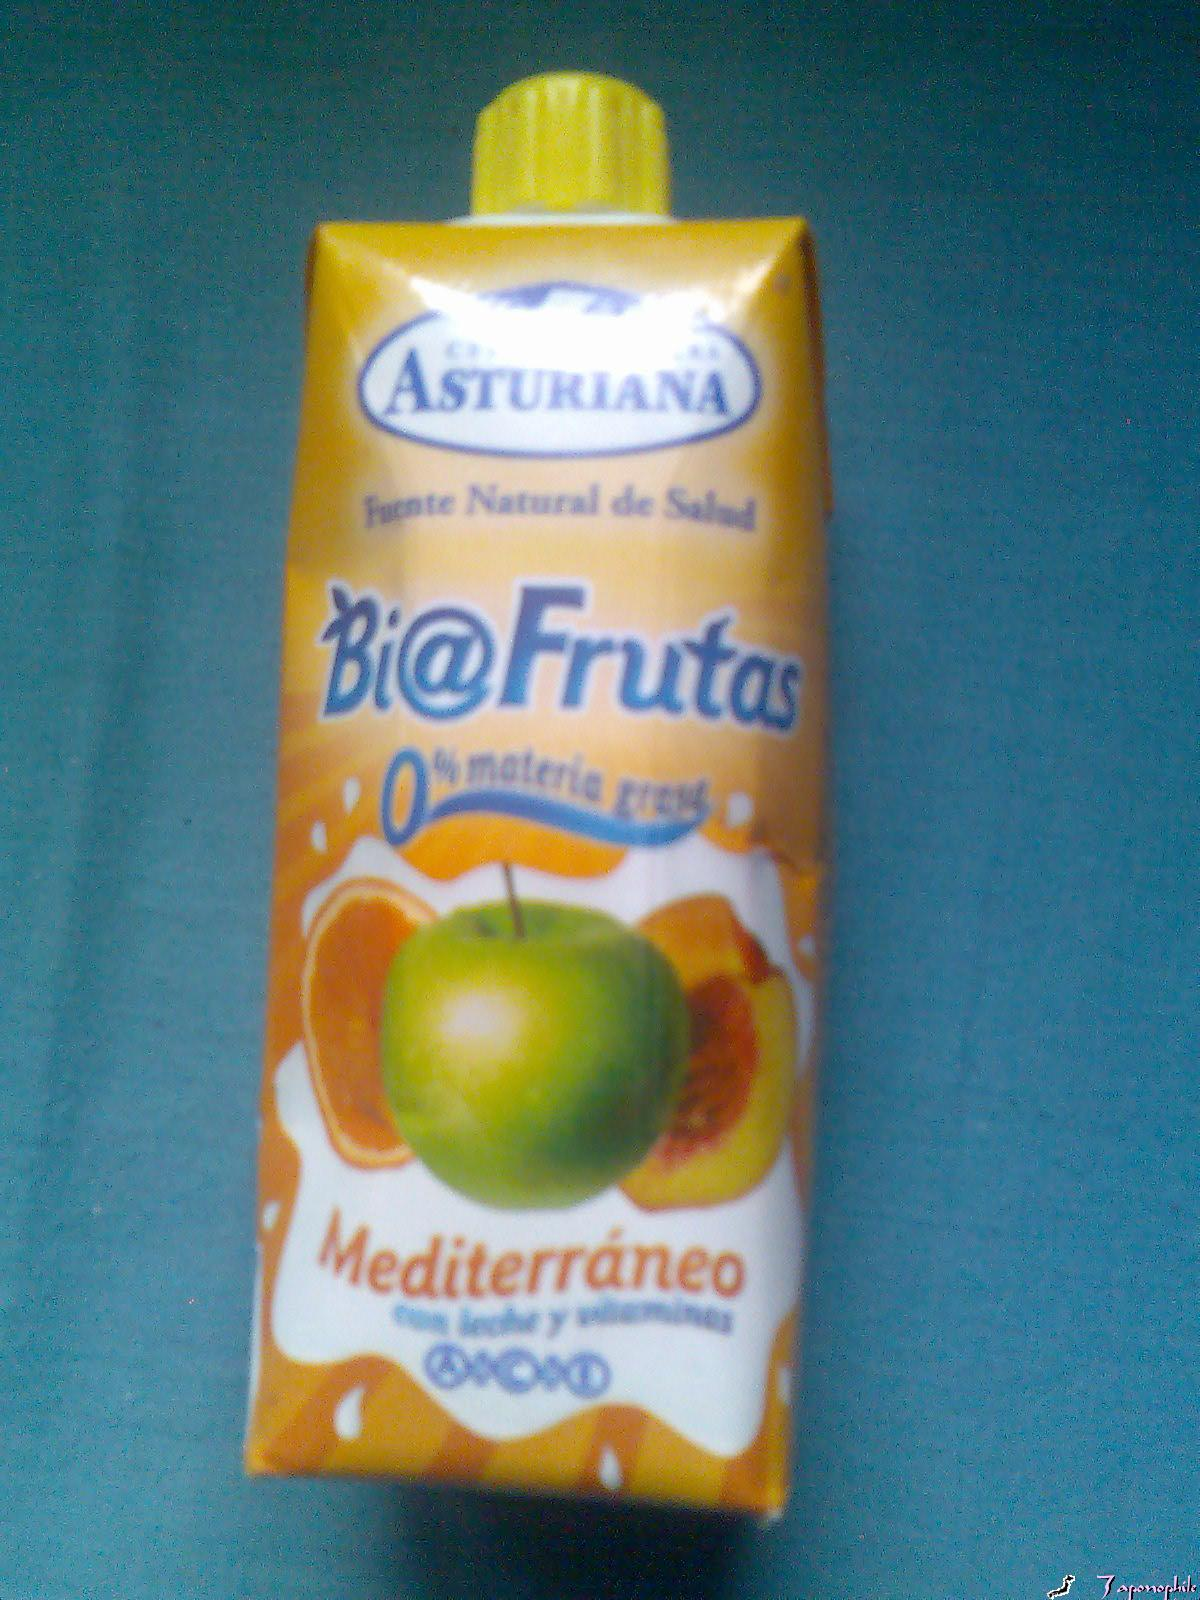 Bi@Frutas de Central Lechera Asturiana